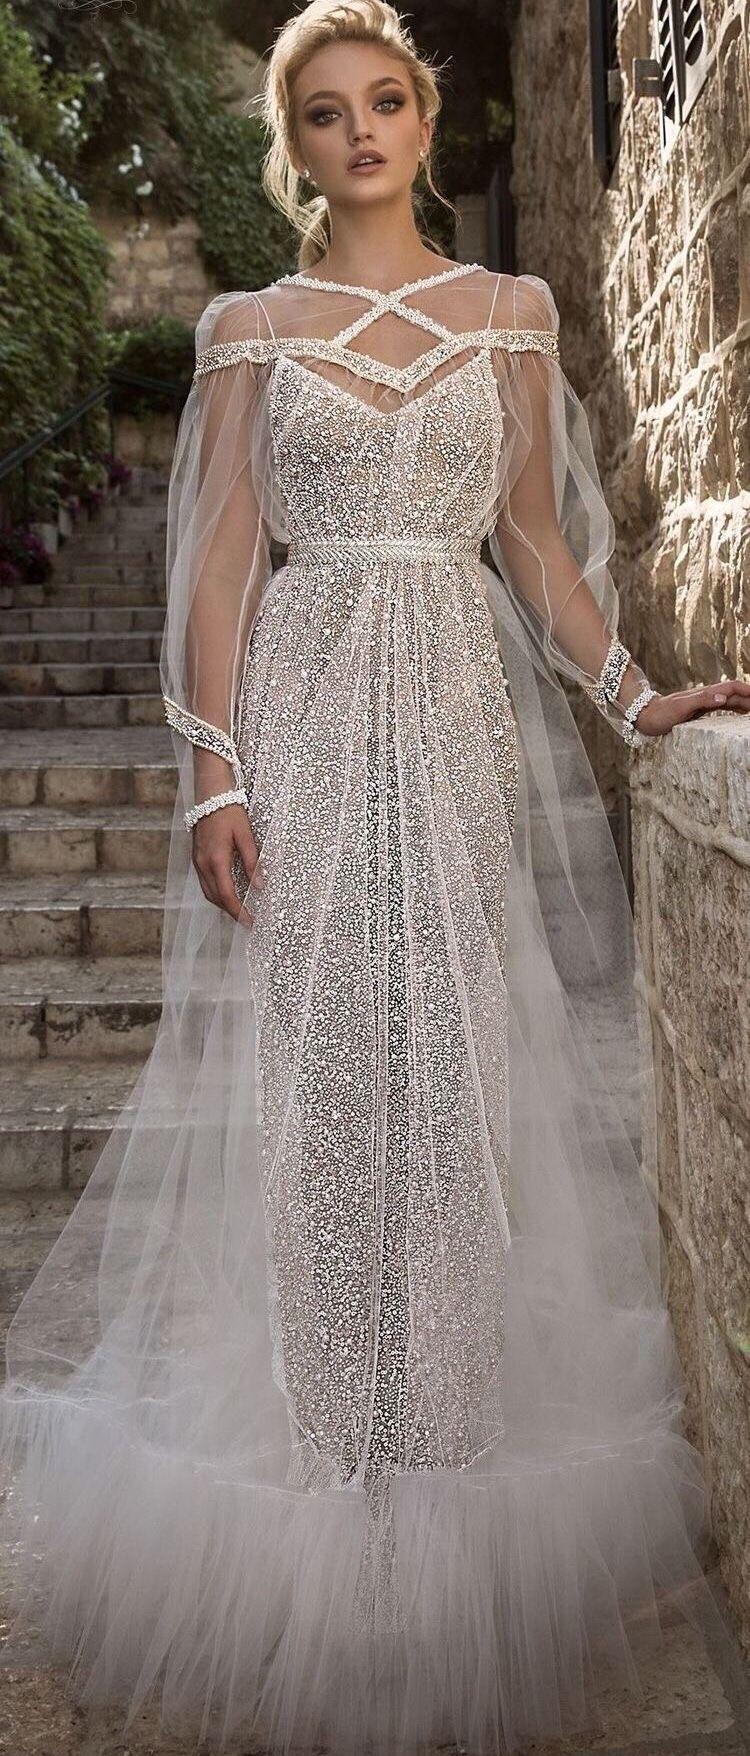 Plus size pink wedding dresses  Weddings  Weddings in   Pinterest  Wedding